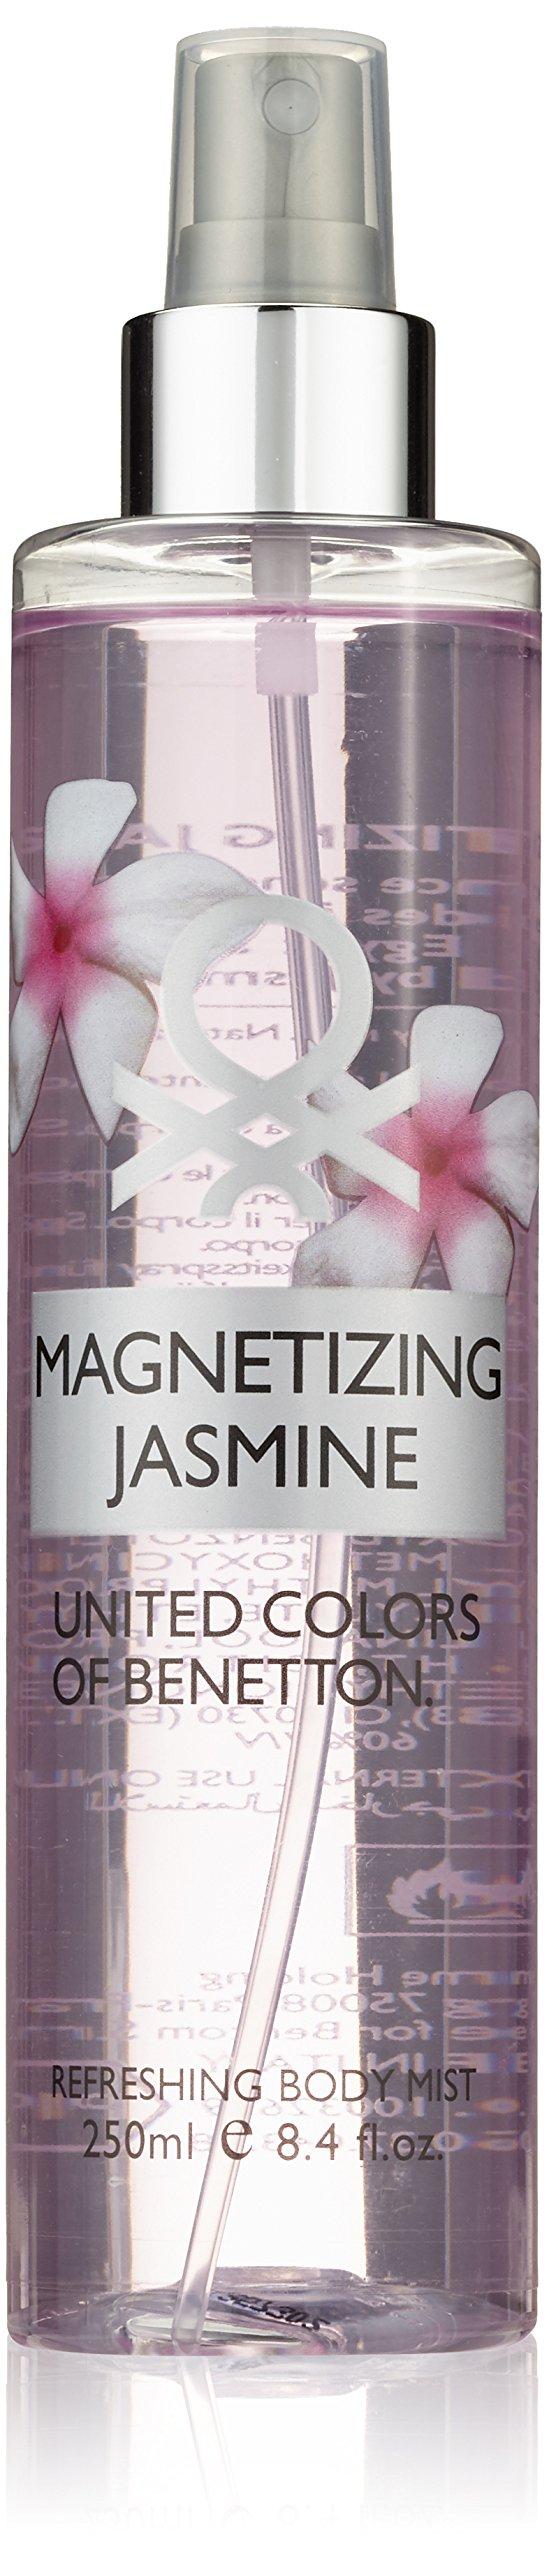 United Colors of Benetton Magnetizing Jasmine Body Mist, 8.4 Ounce